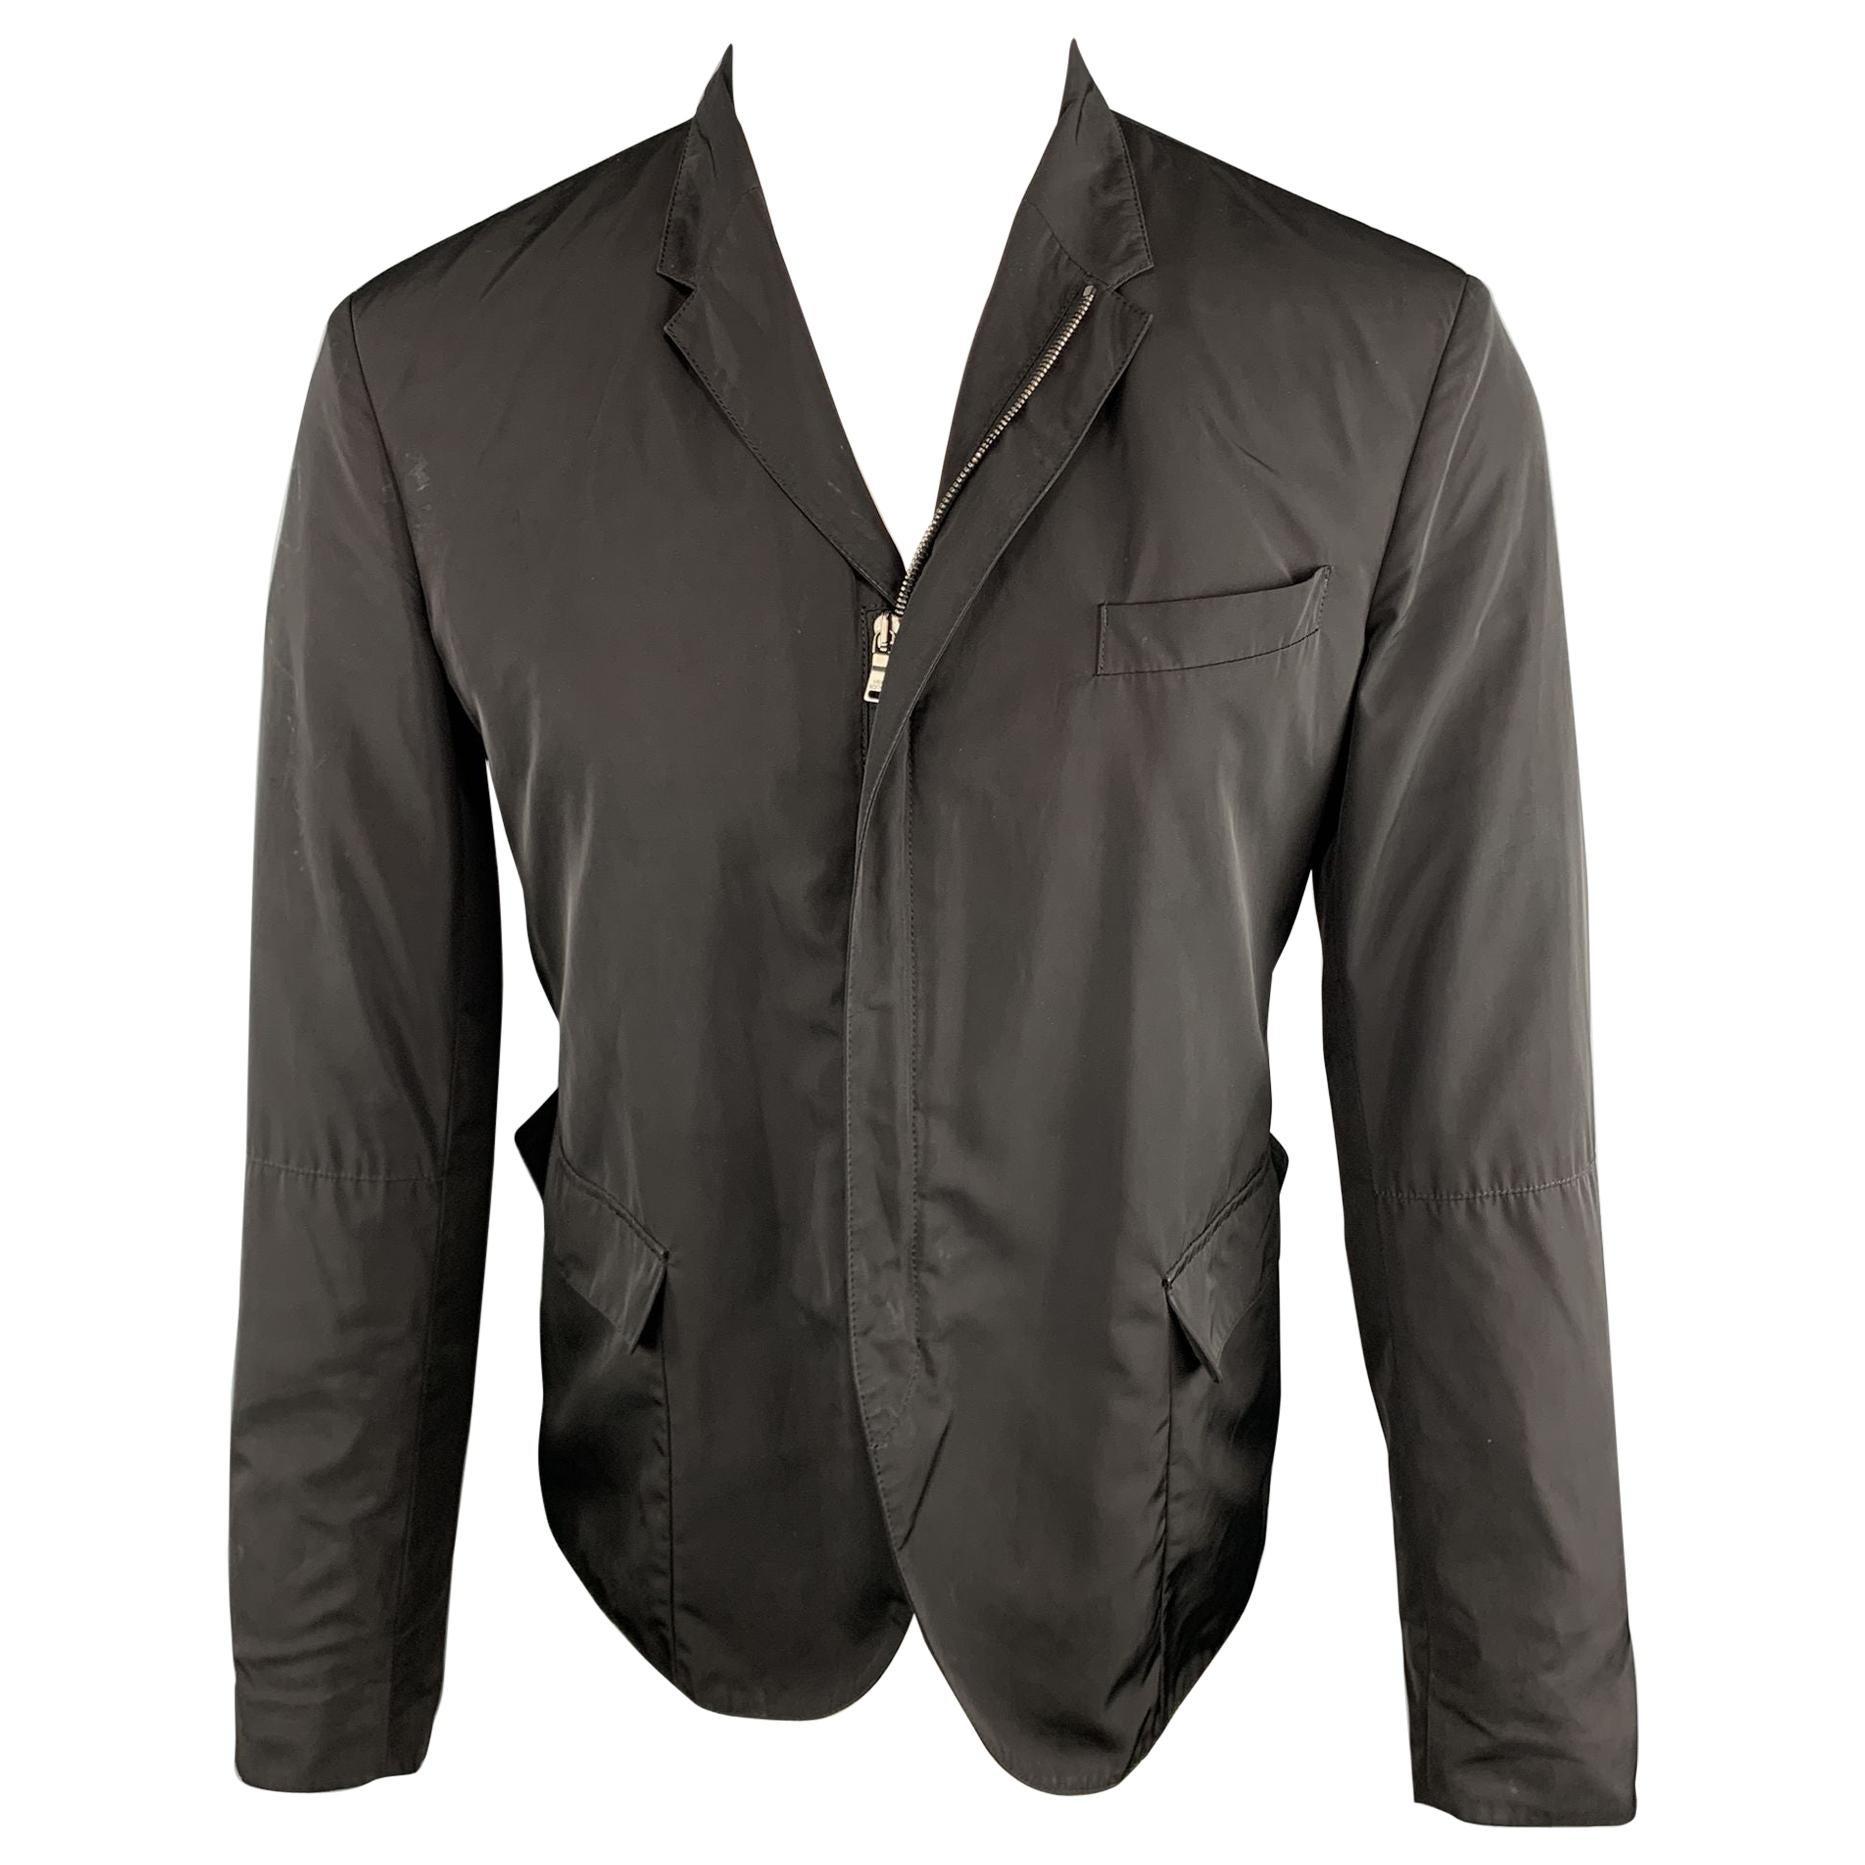 NEIL BARRETT Chest Size S Solid Black Polyester Full Zip Jacket